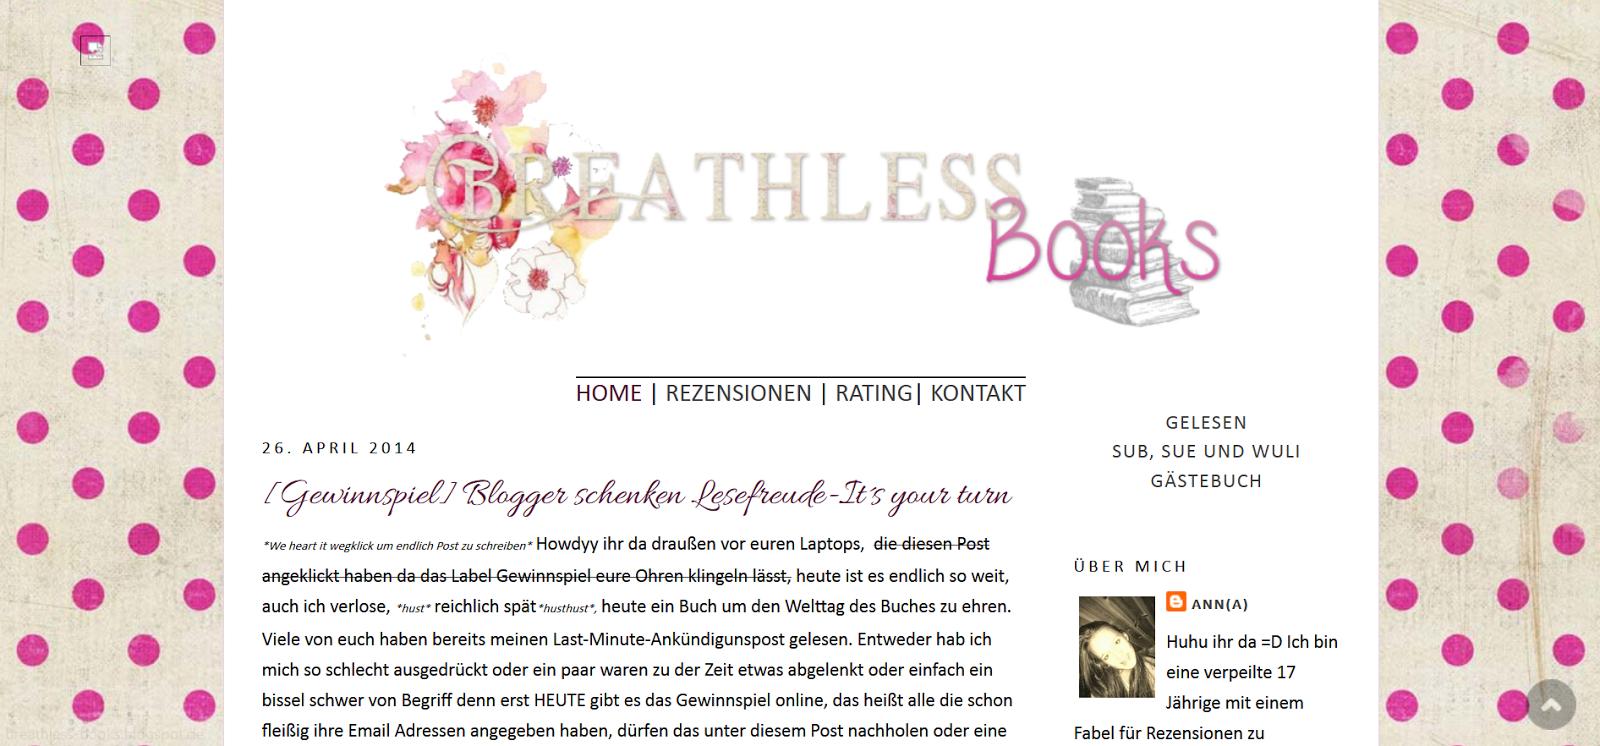 http://breathless-books.blogspot.de/